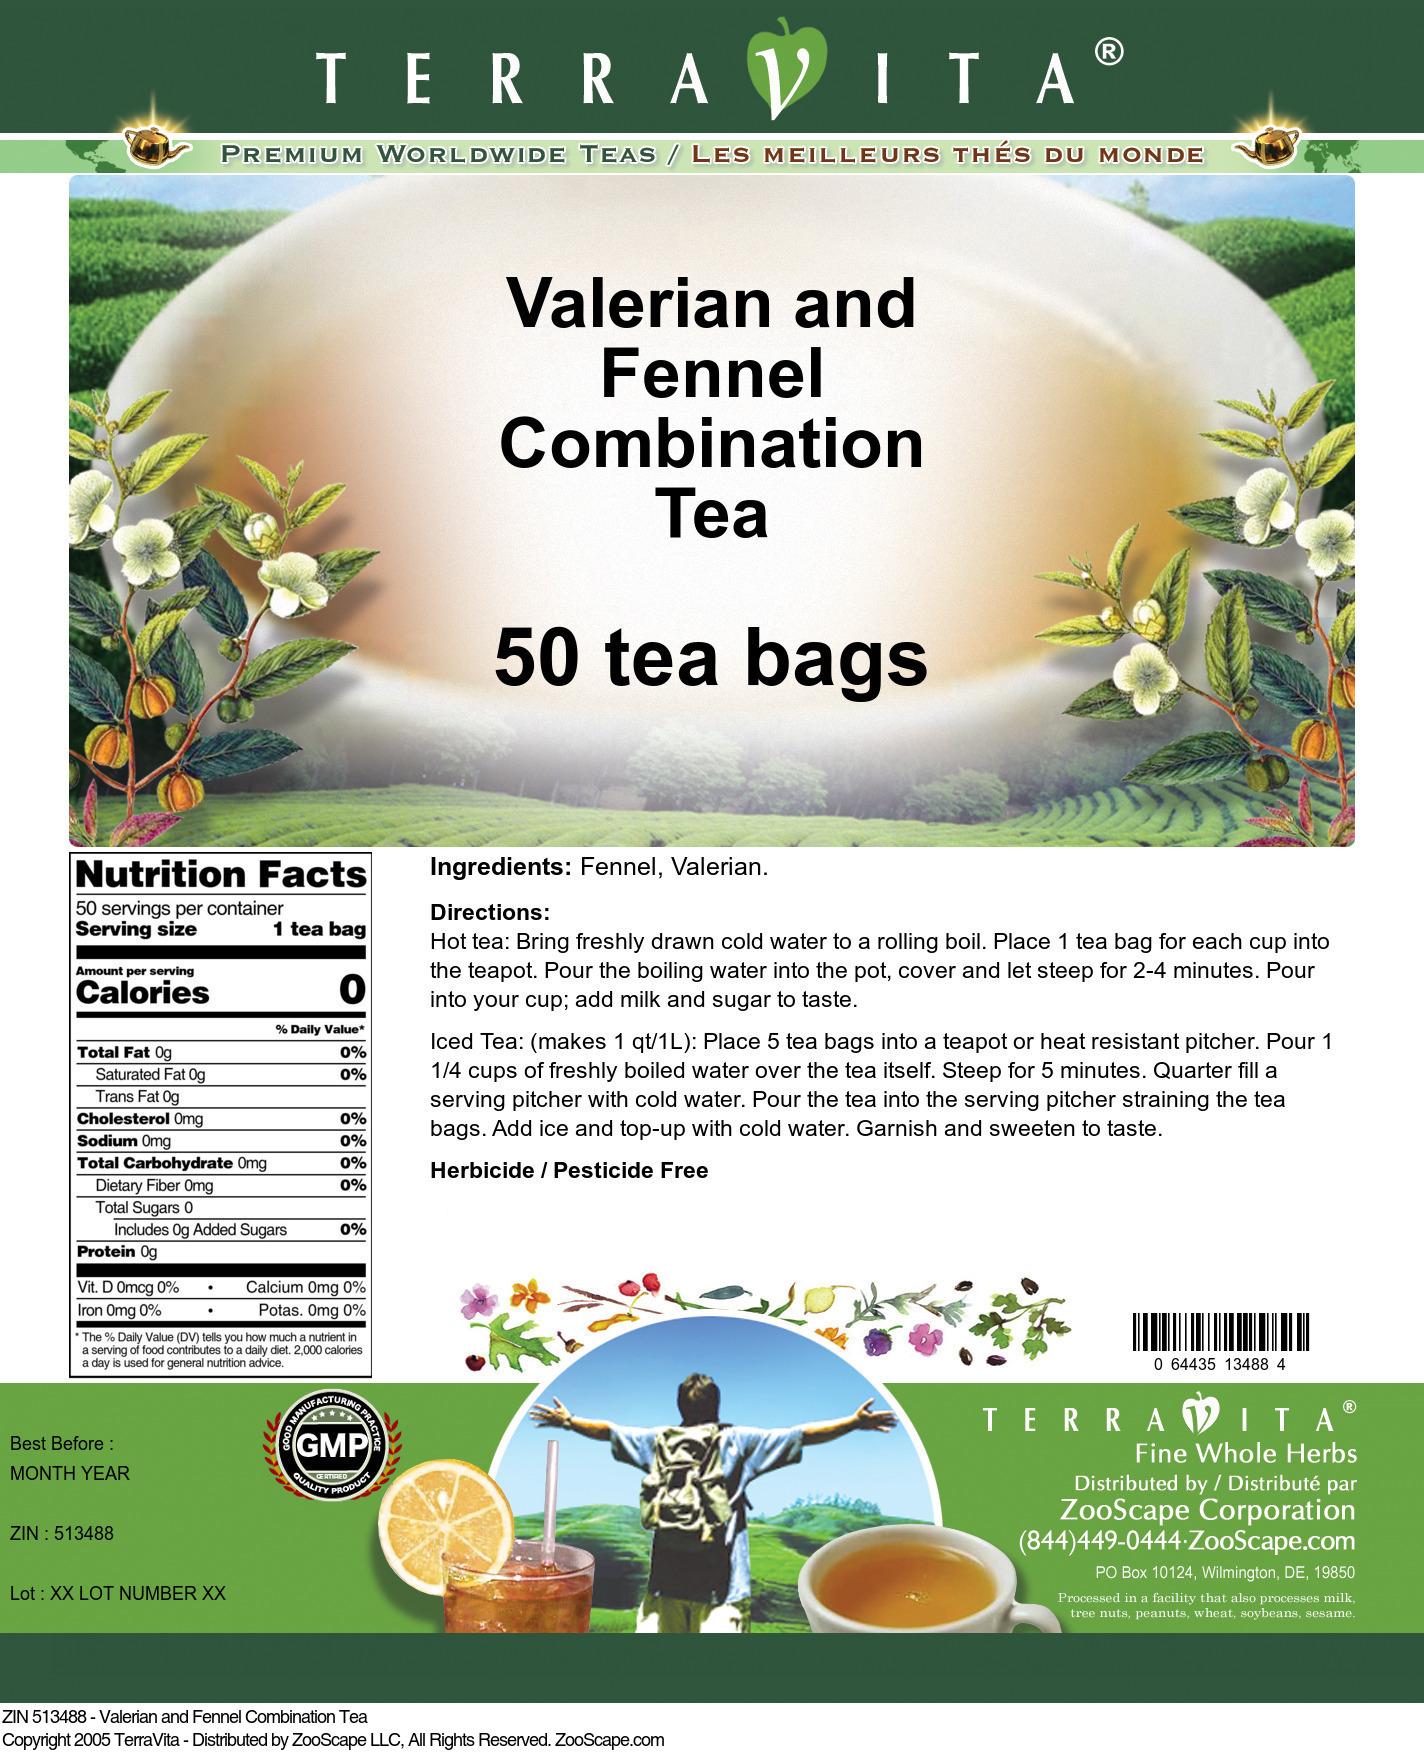 Valerian and Fennel Combination Tea